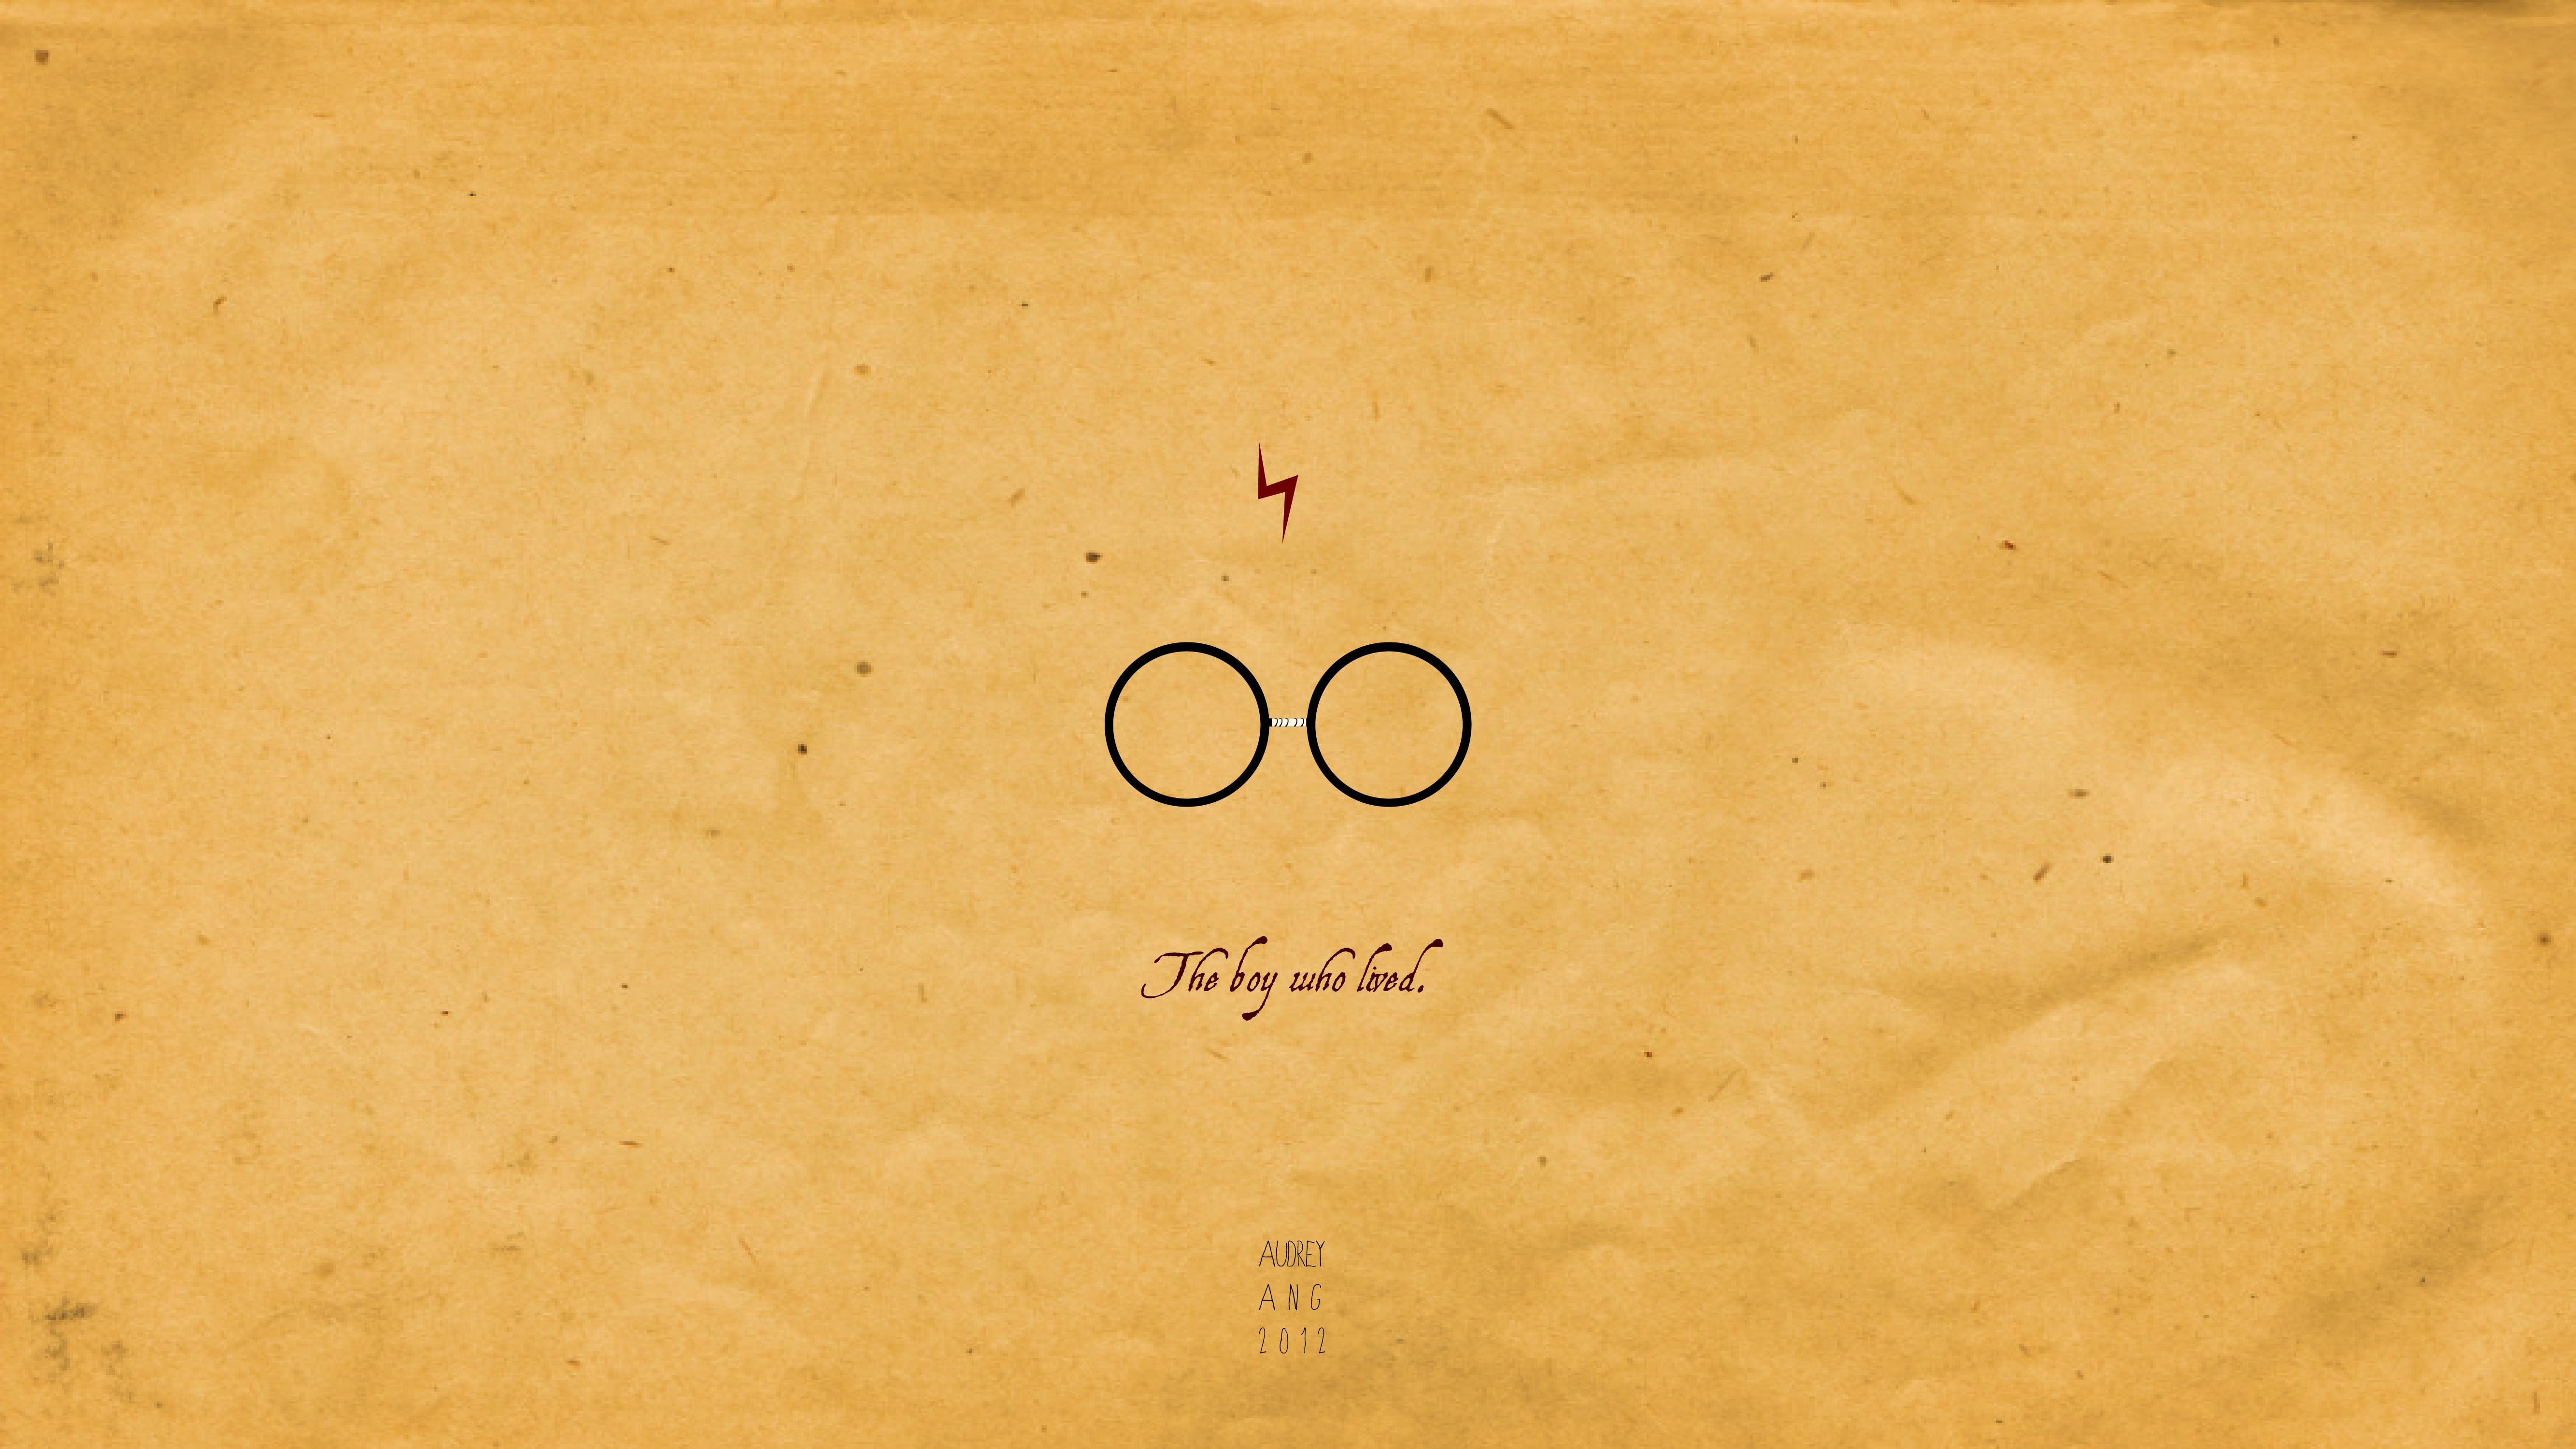 Harry Potter Wallpapers For Iphone Papel De Parede Pc Papel De Parede Do Notebook Fundos Para Pc